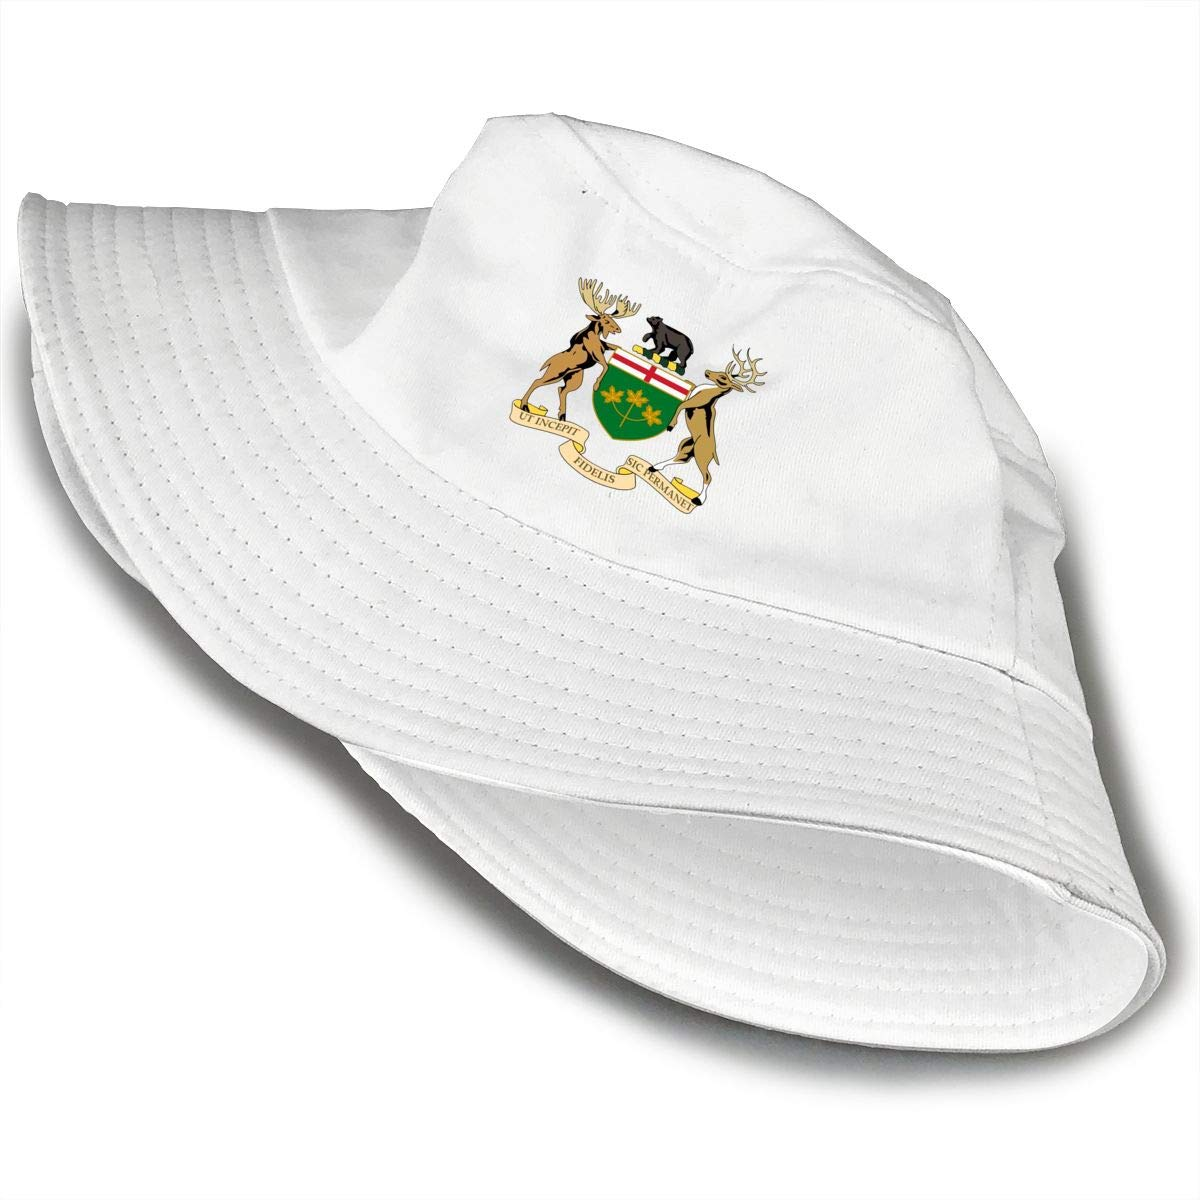 NDFGR Coat of Arms of Ontario Unisex Cotton Packable Black Travel Bucket Hat Fishing Cap